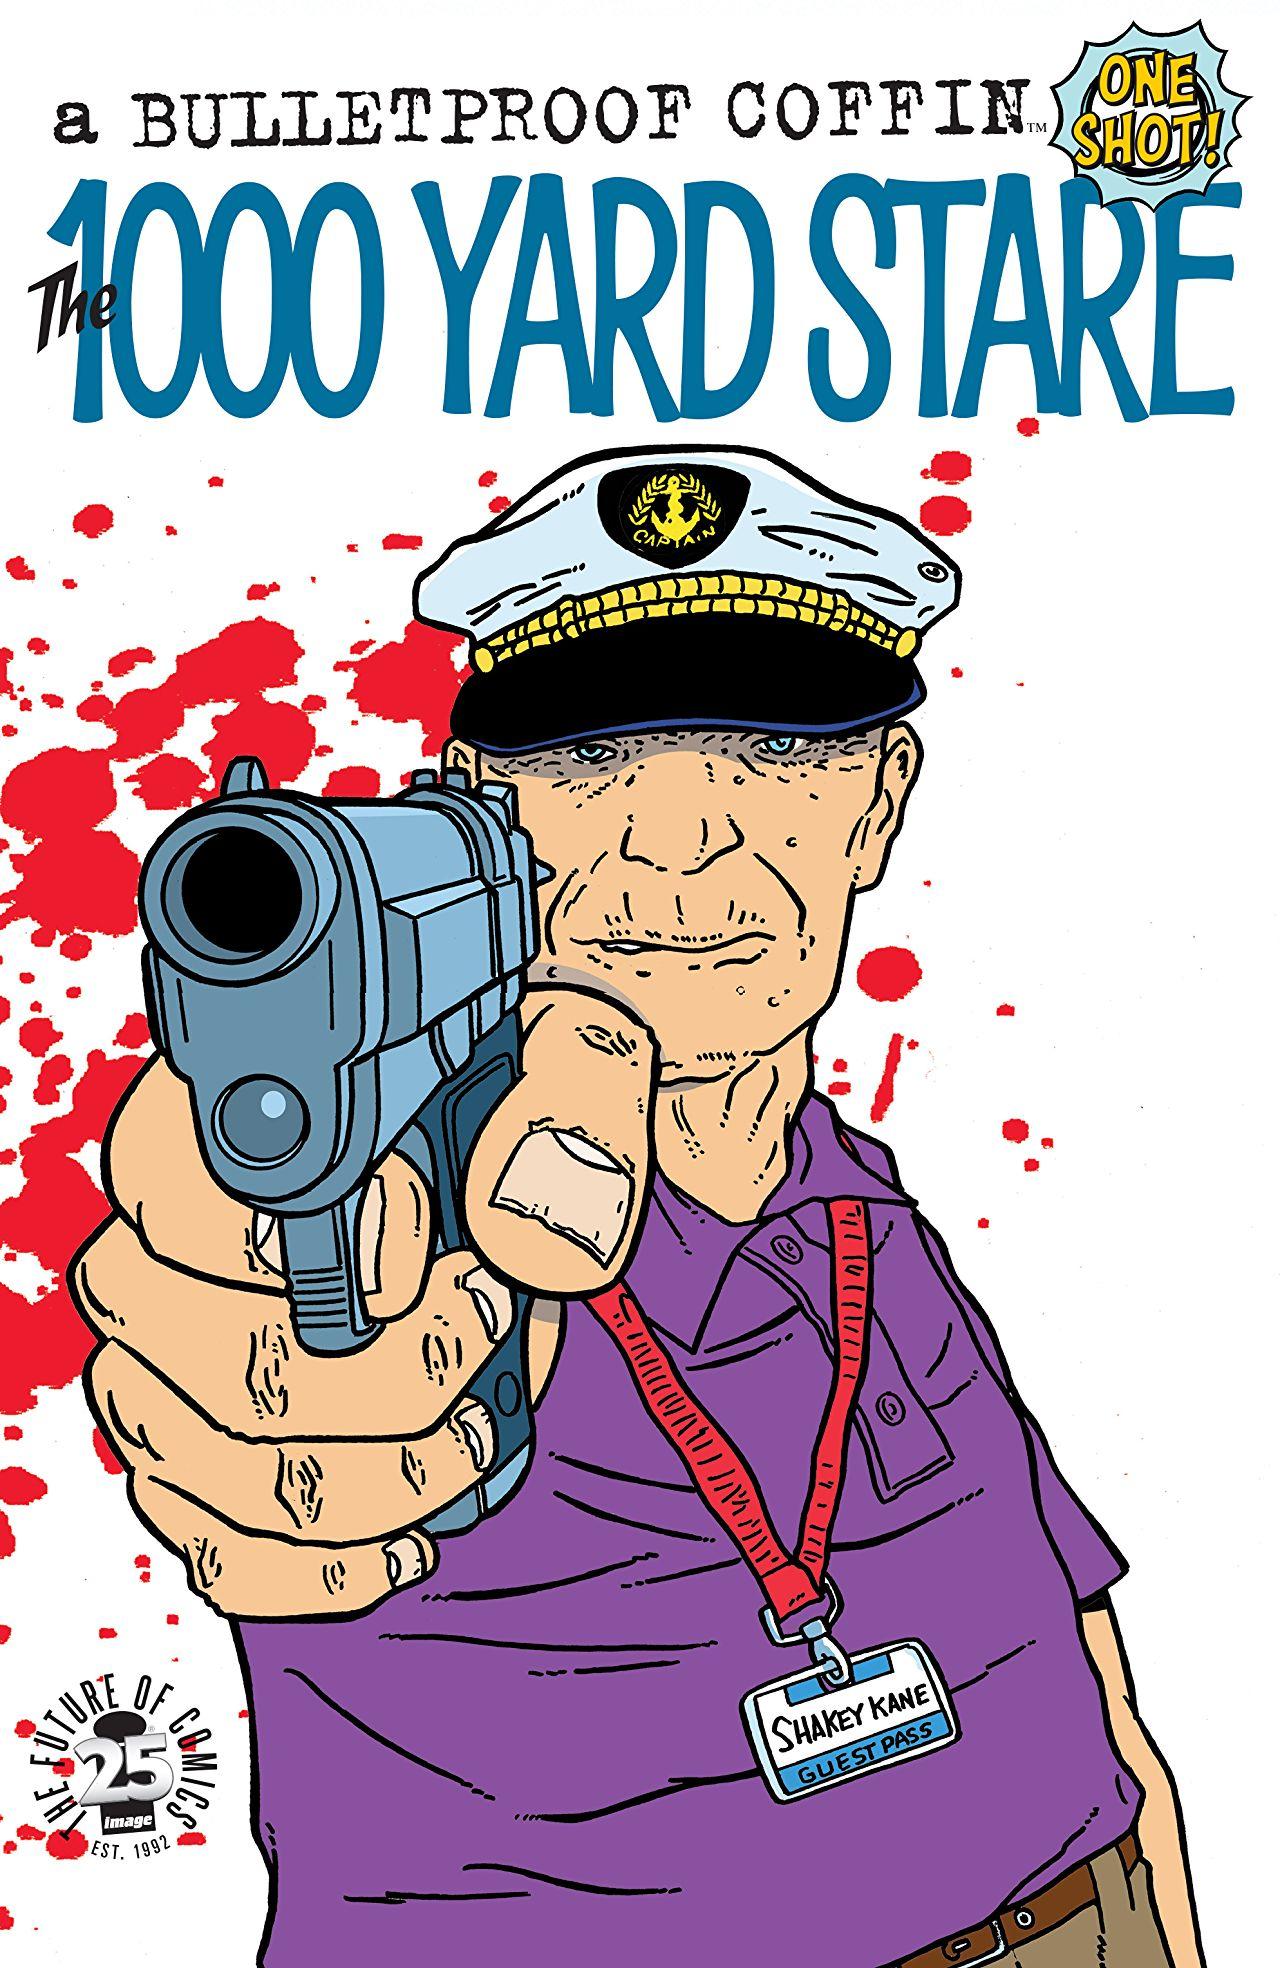 http://www.pastemagazine.com/articles/BulletproofCoffin.jpg